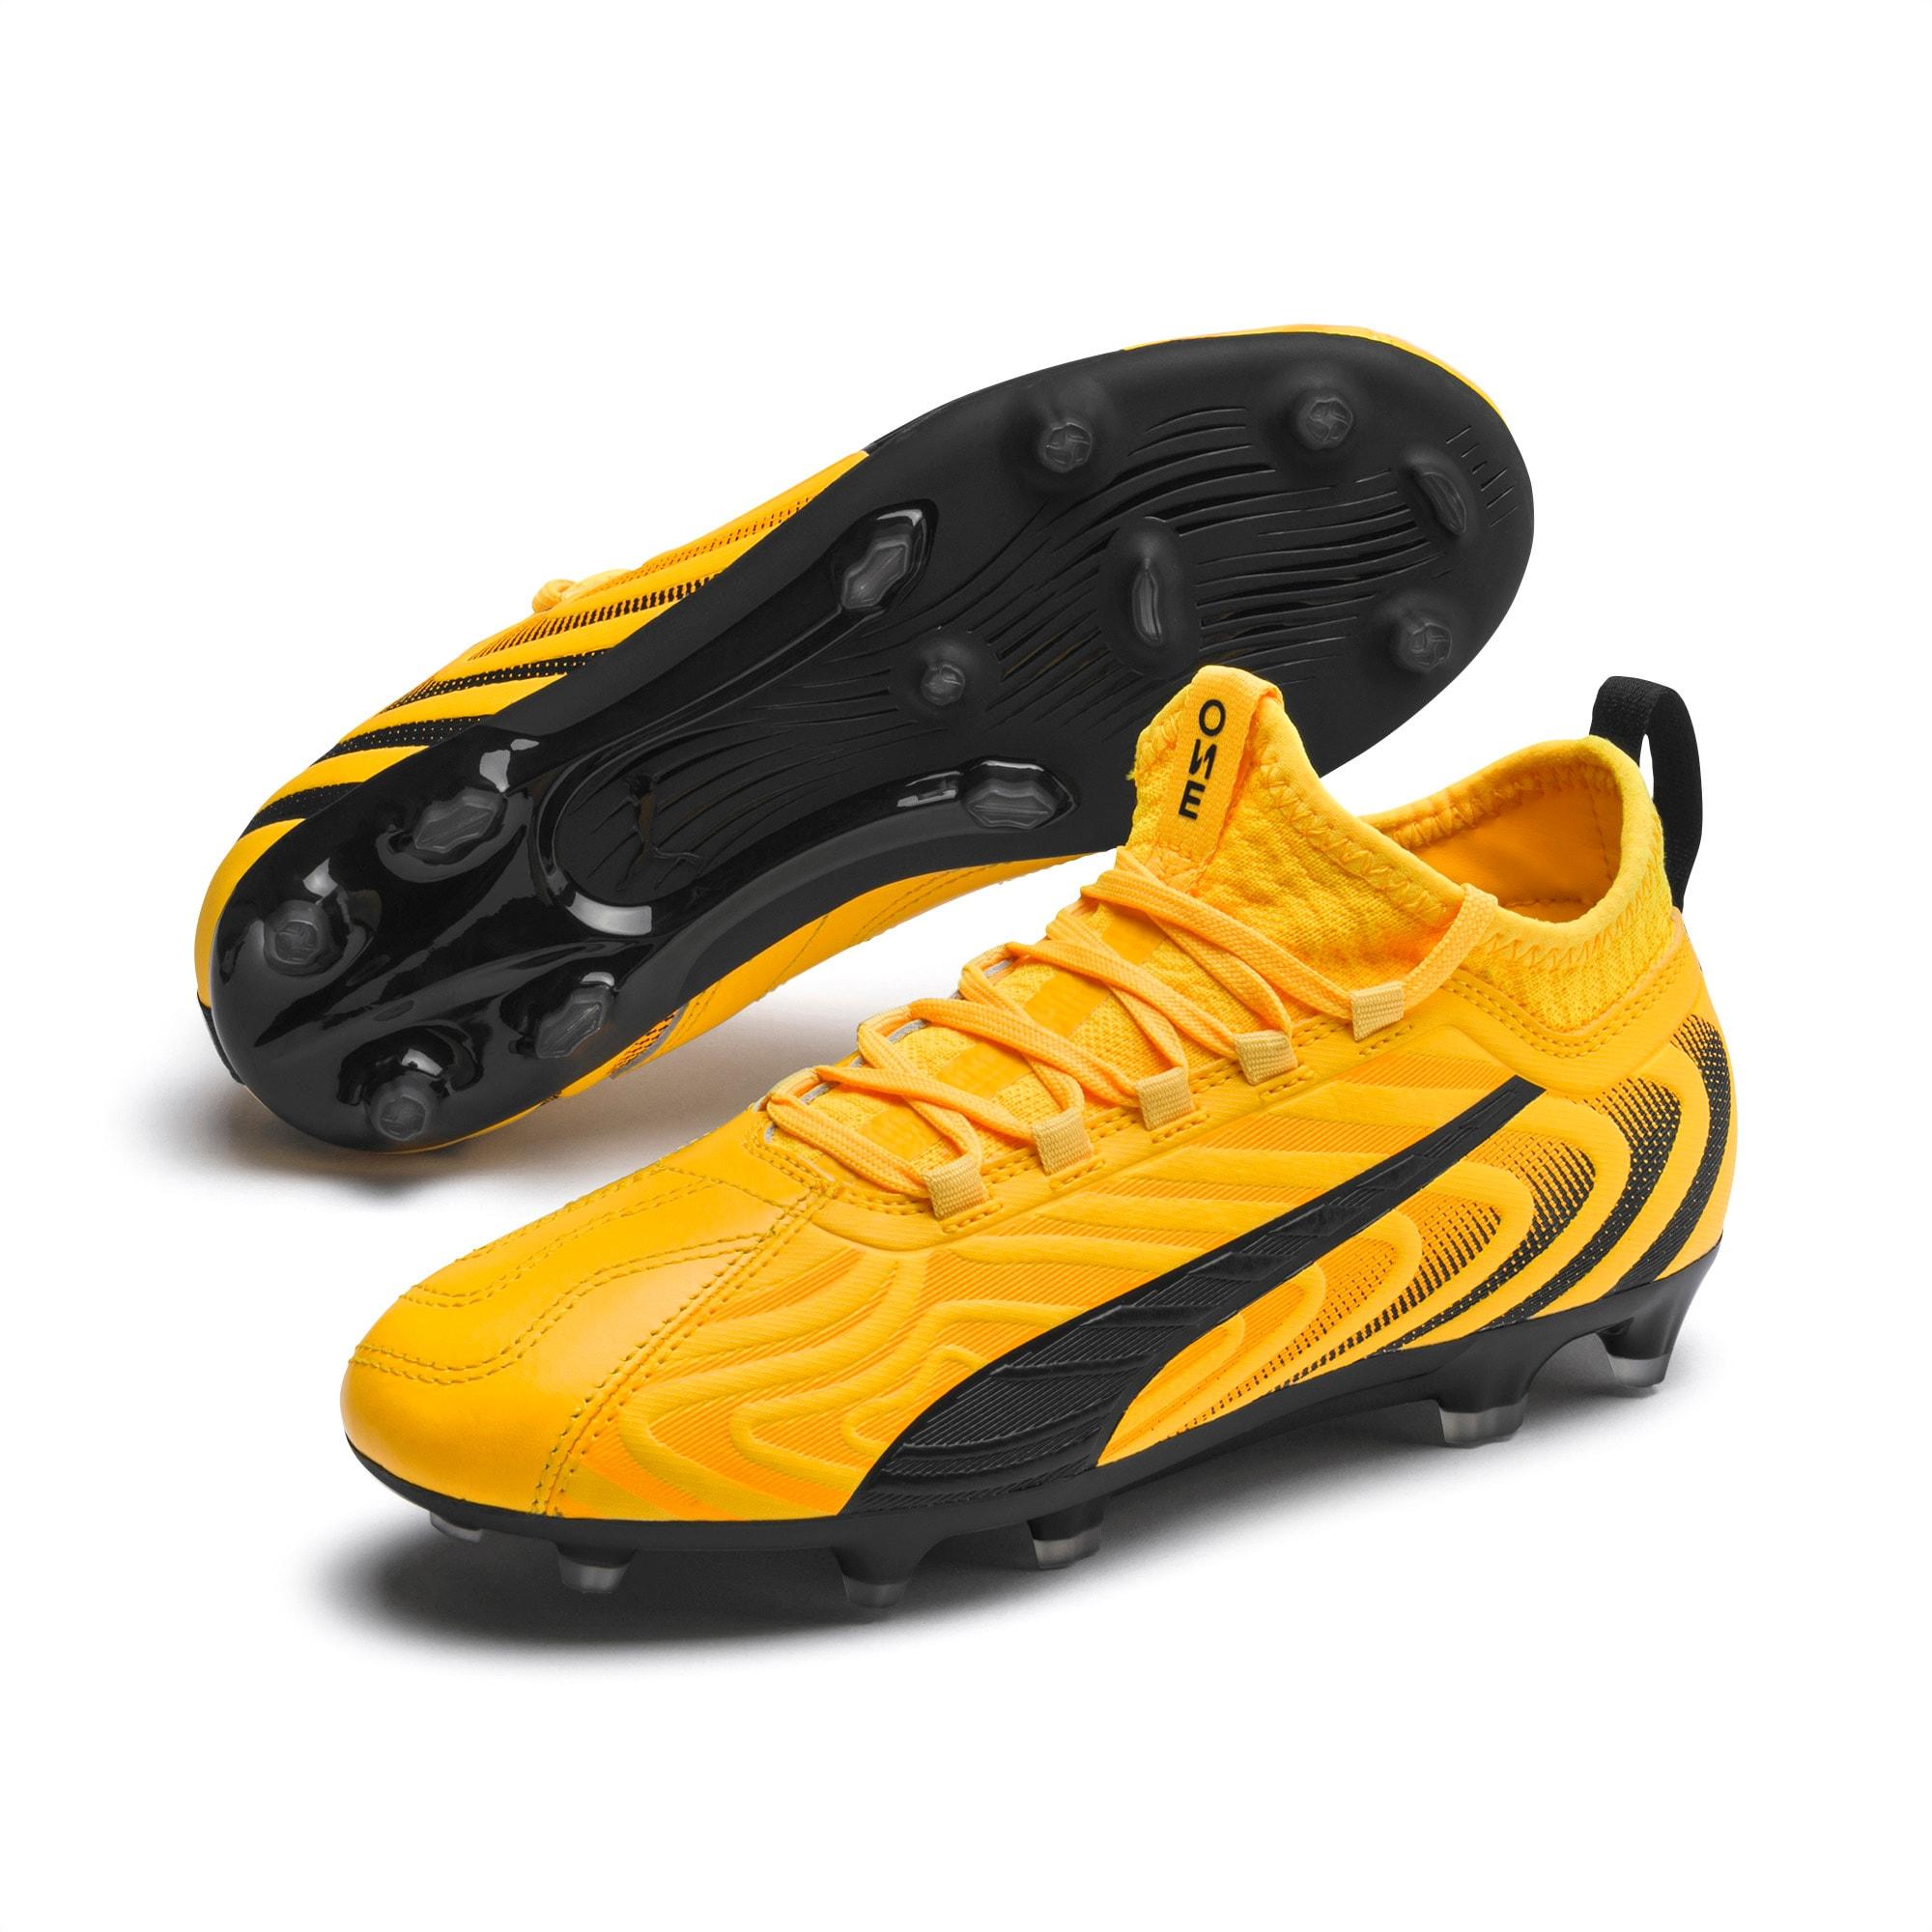 PUMA ONE 20.3 FG/AG Soccer Cleats JR